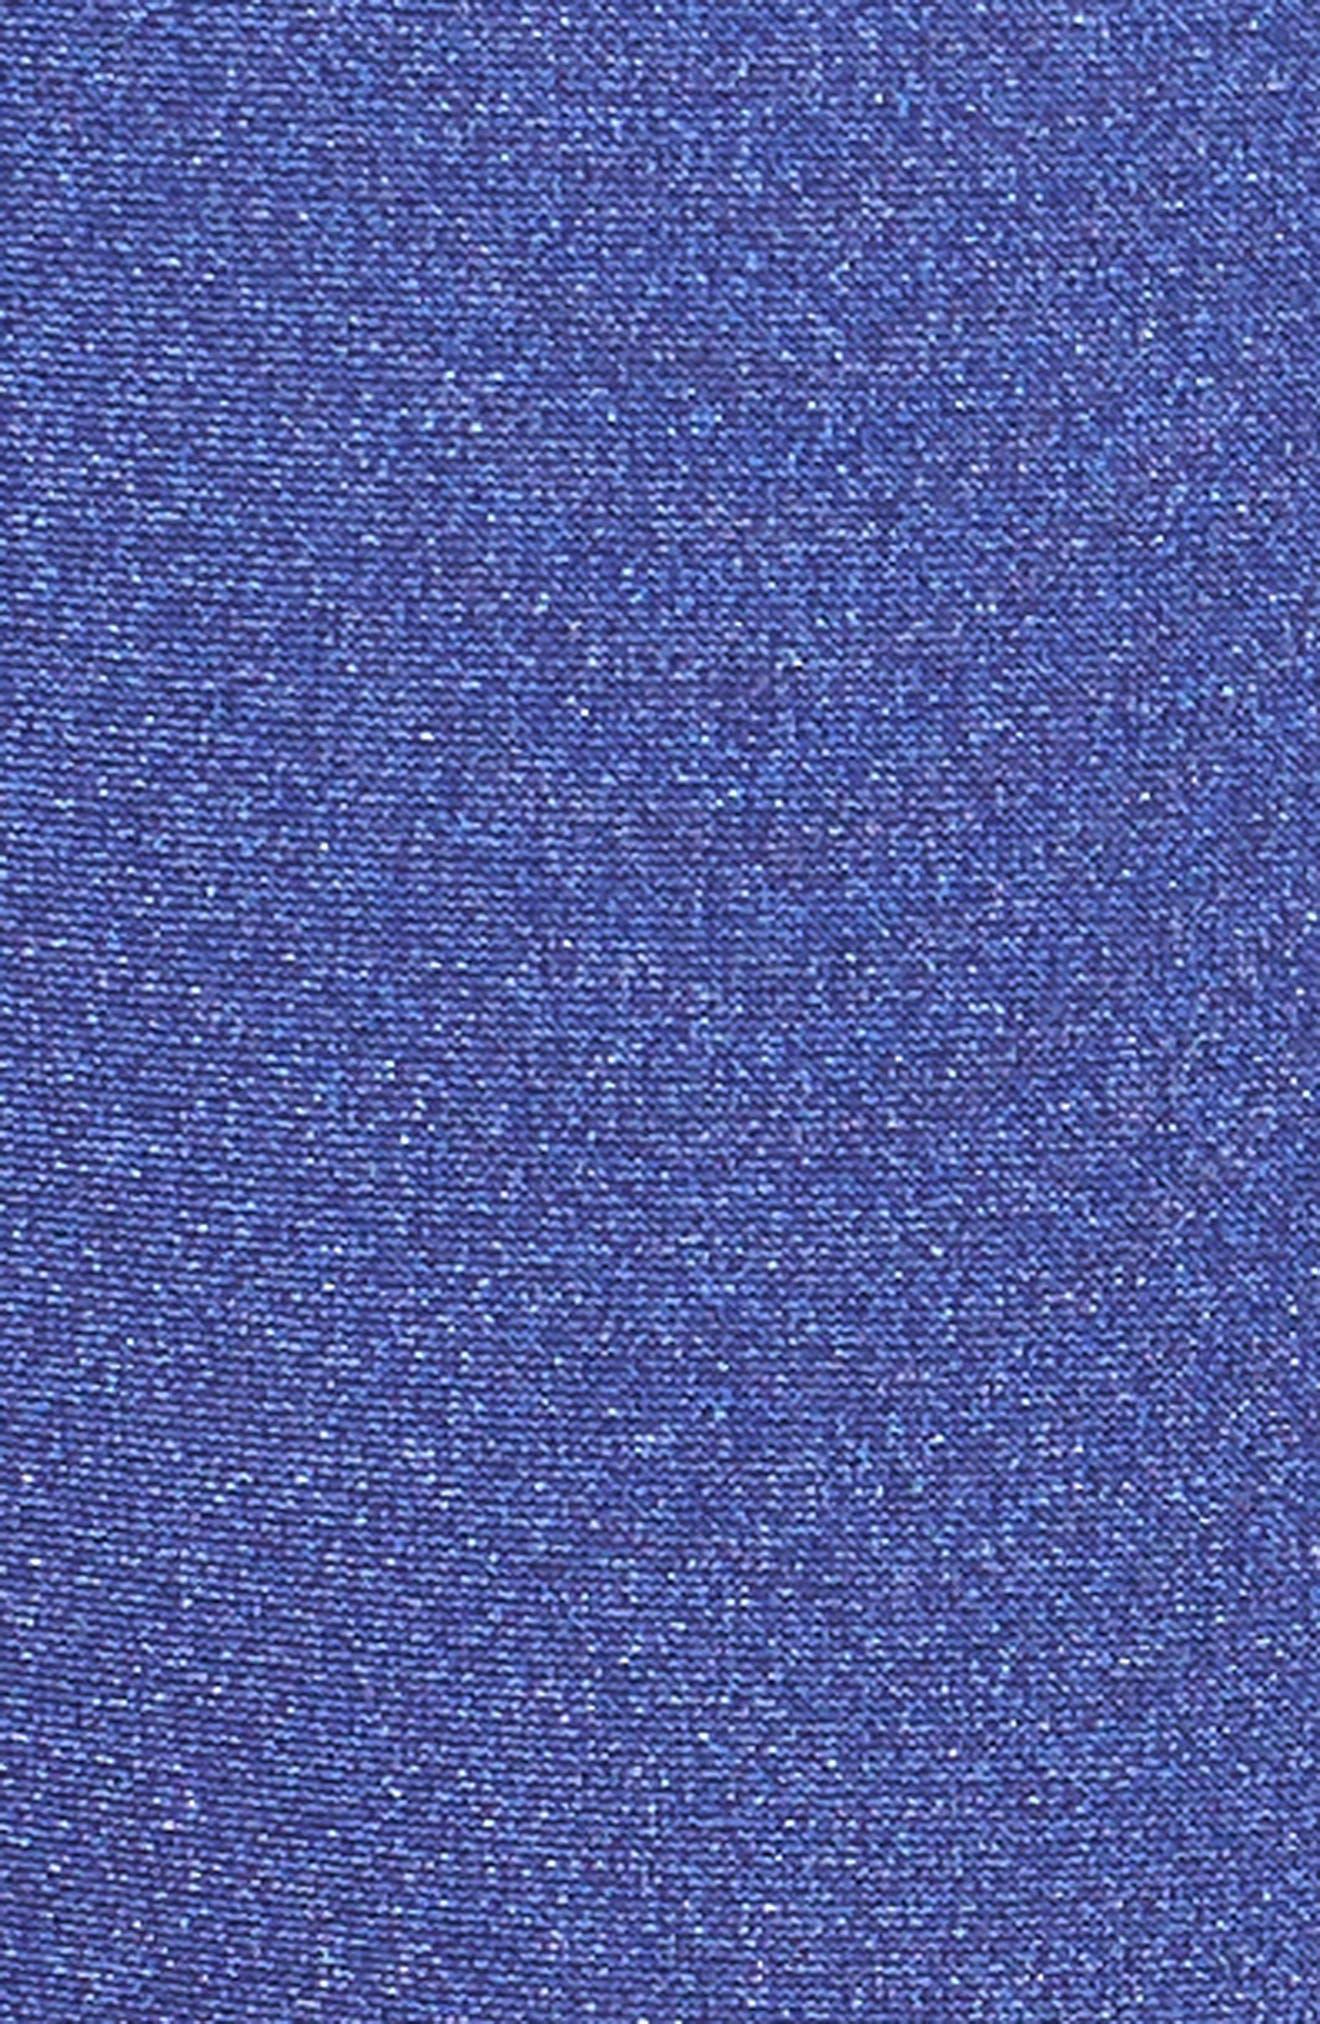 Siren Bikini Bottoms,                             Alternate thumbnail 6, color,                             Blue Topaz